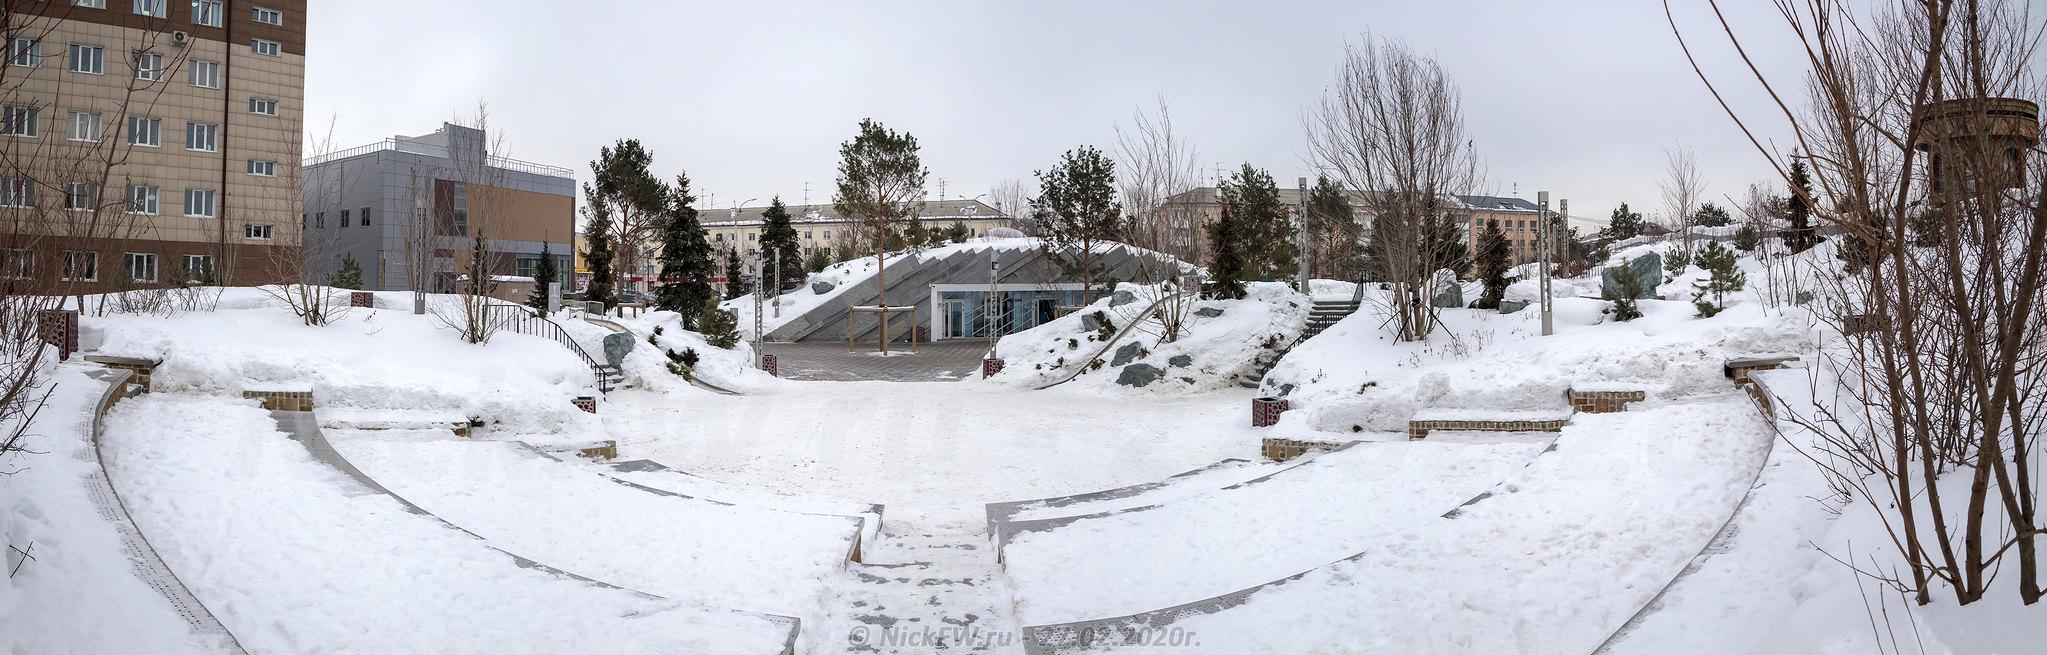 4. Амфитеатр - Парк Ангелов - панорама © NickFW.ru - 27.02.2020г.